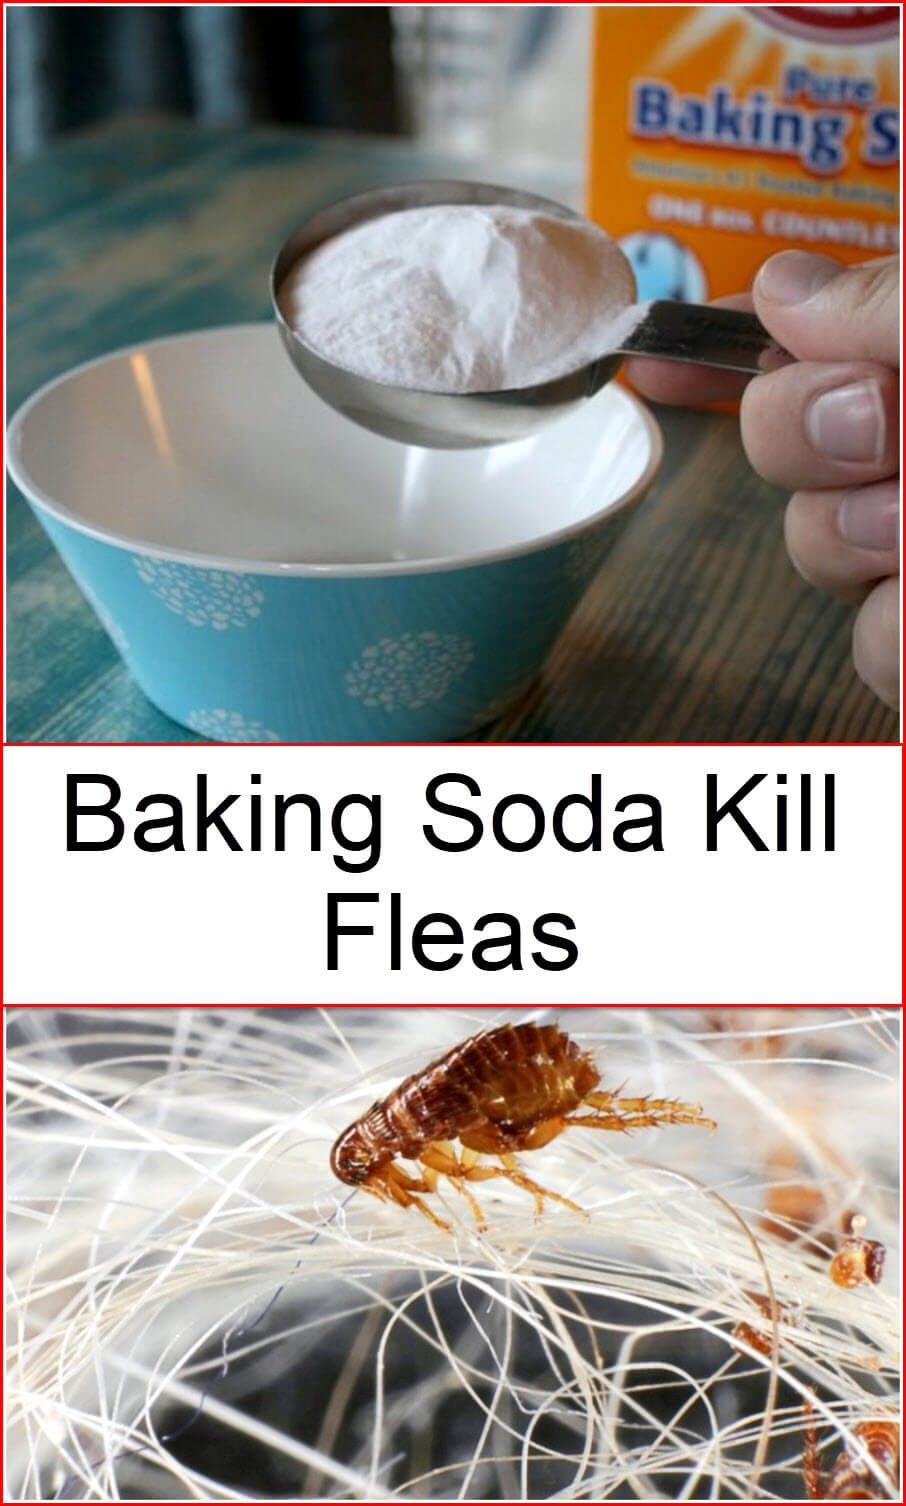 Baking Soda Kill Fleas Flea Remedies Dog Flea Remedies Baking Soda Uses